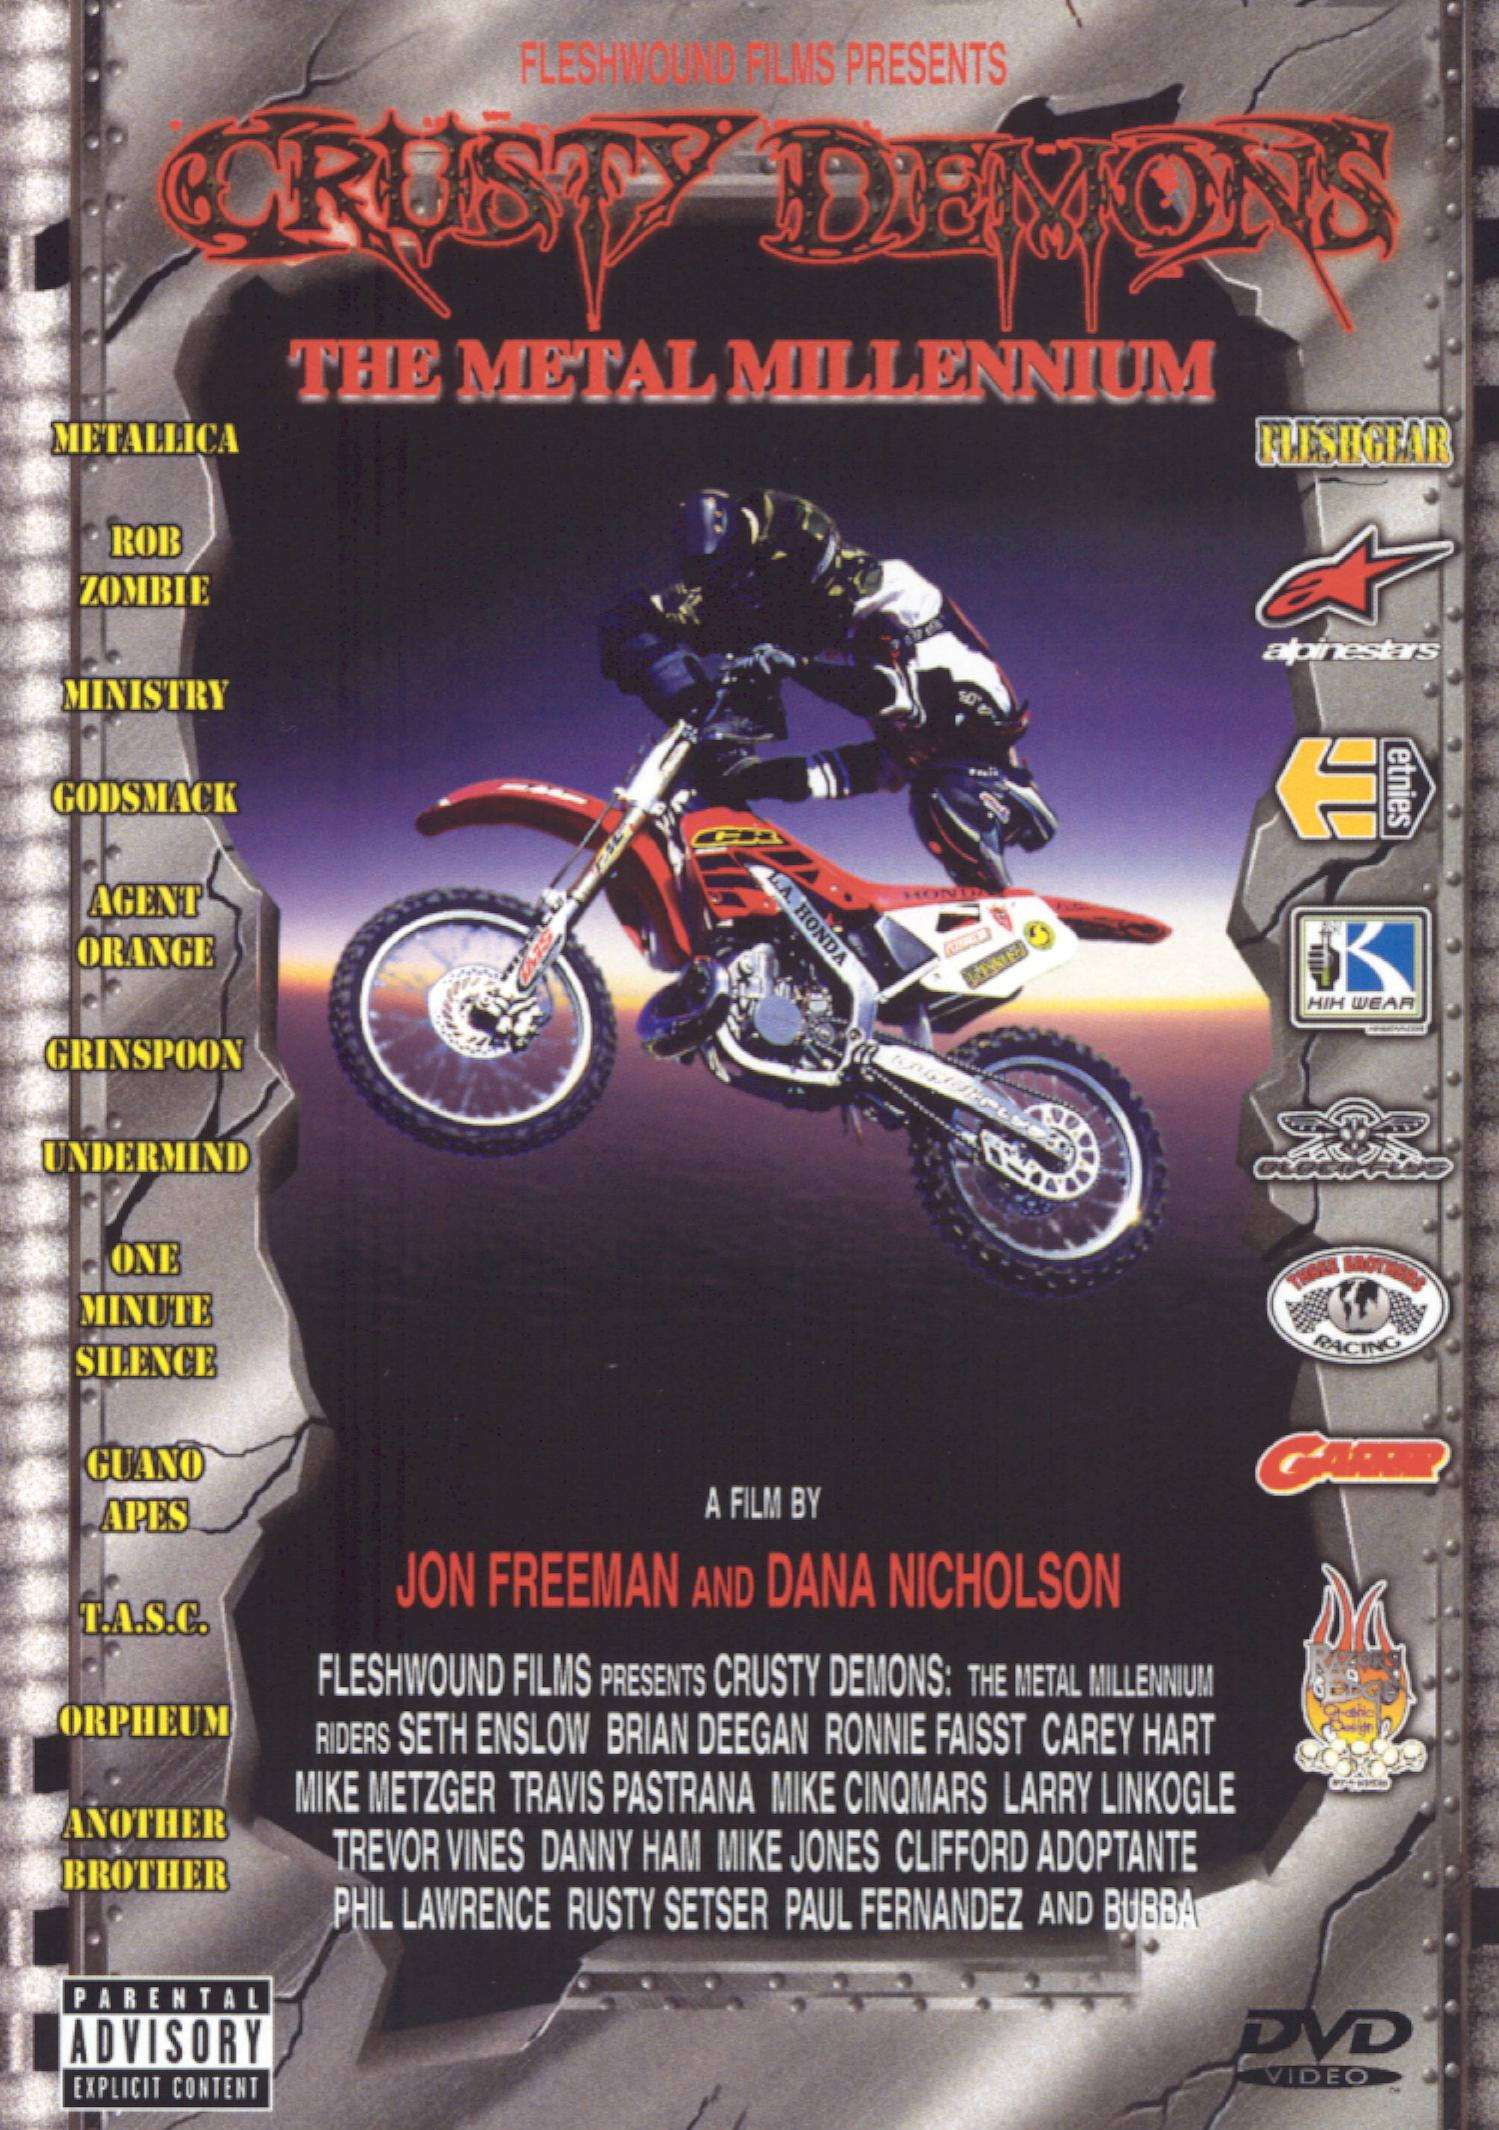 Crusty Demons: The Metal Millennium